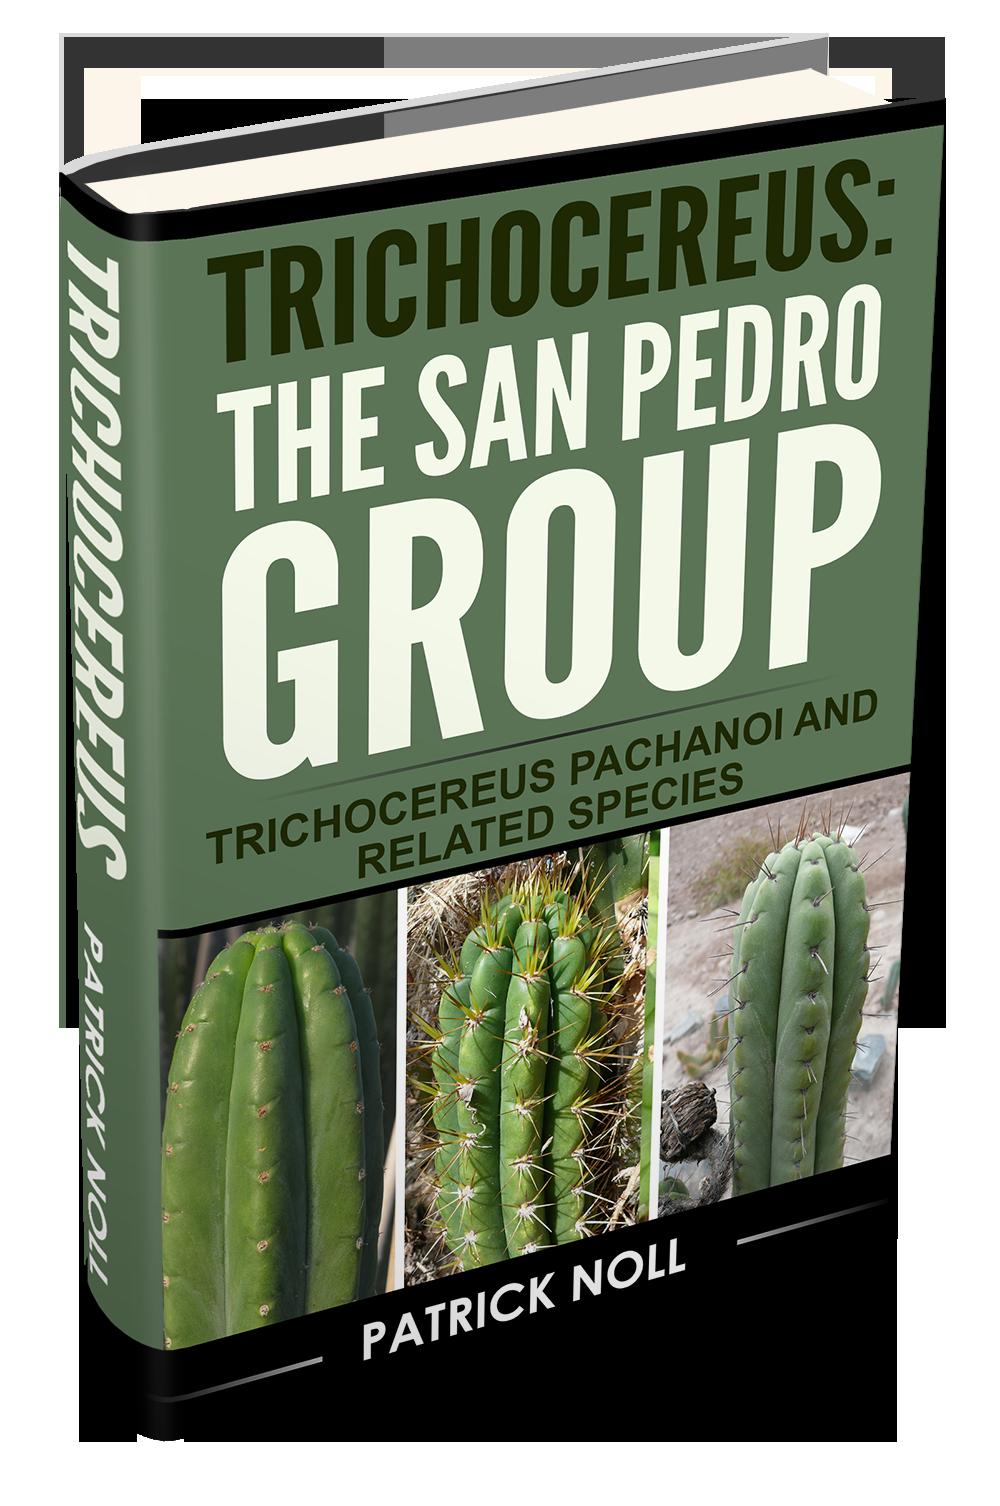 Crowdfunding Campaign TRICHOCEREUS book VOLUME 1